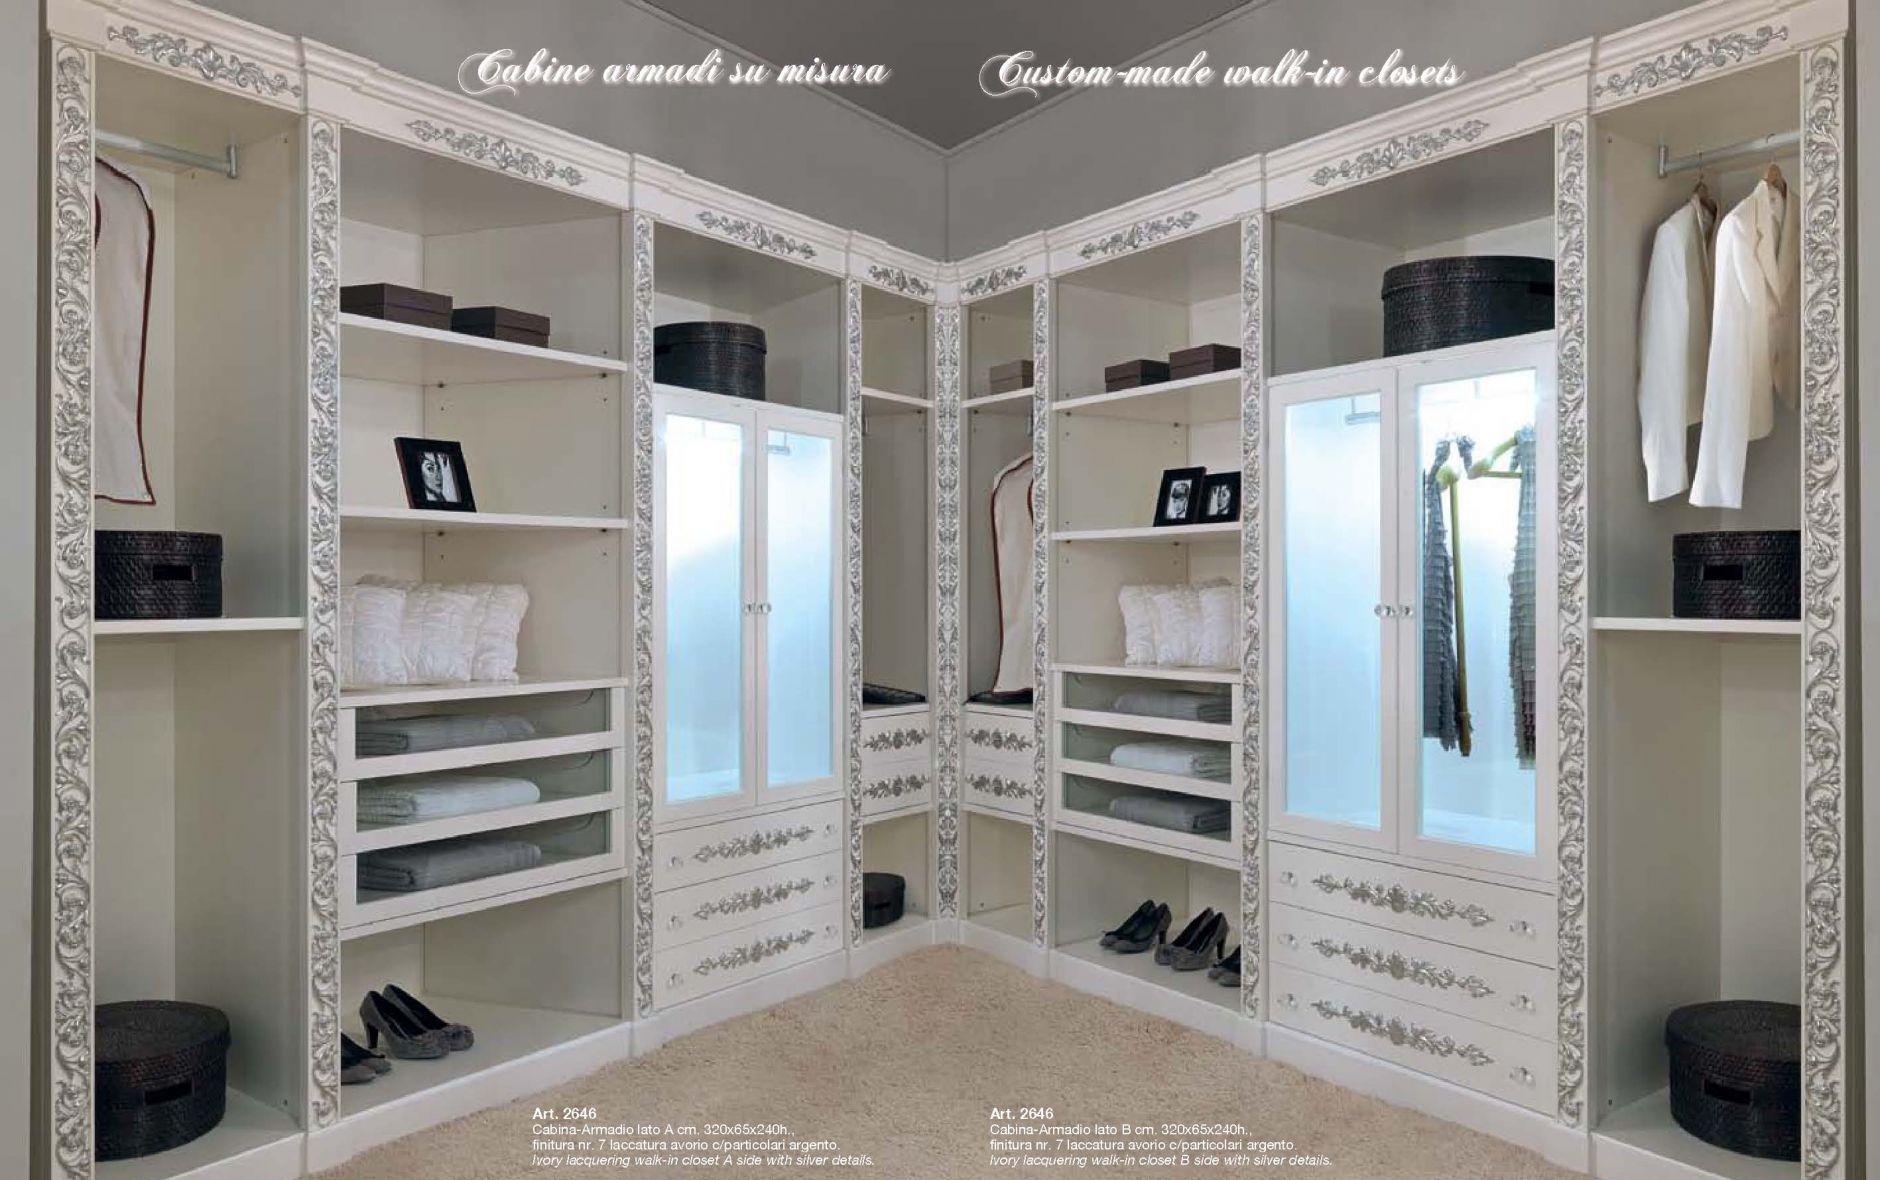 Muebles de lujo - Un lujoso armario ESTILO CEPPIMuebles de Italia